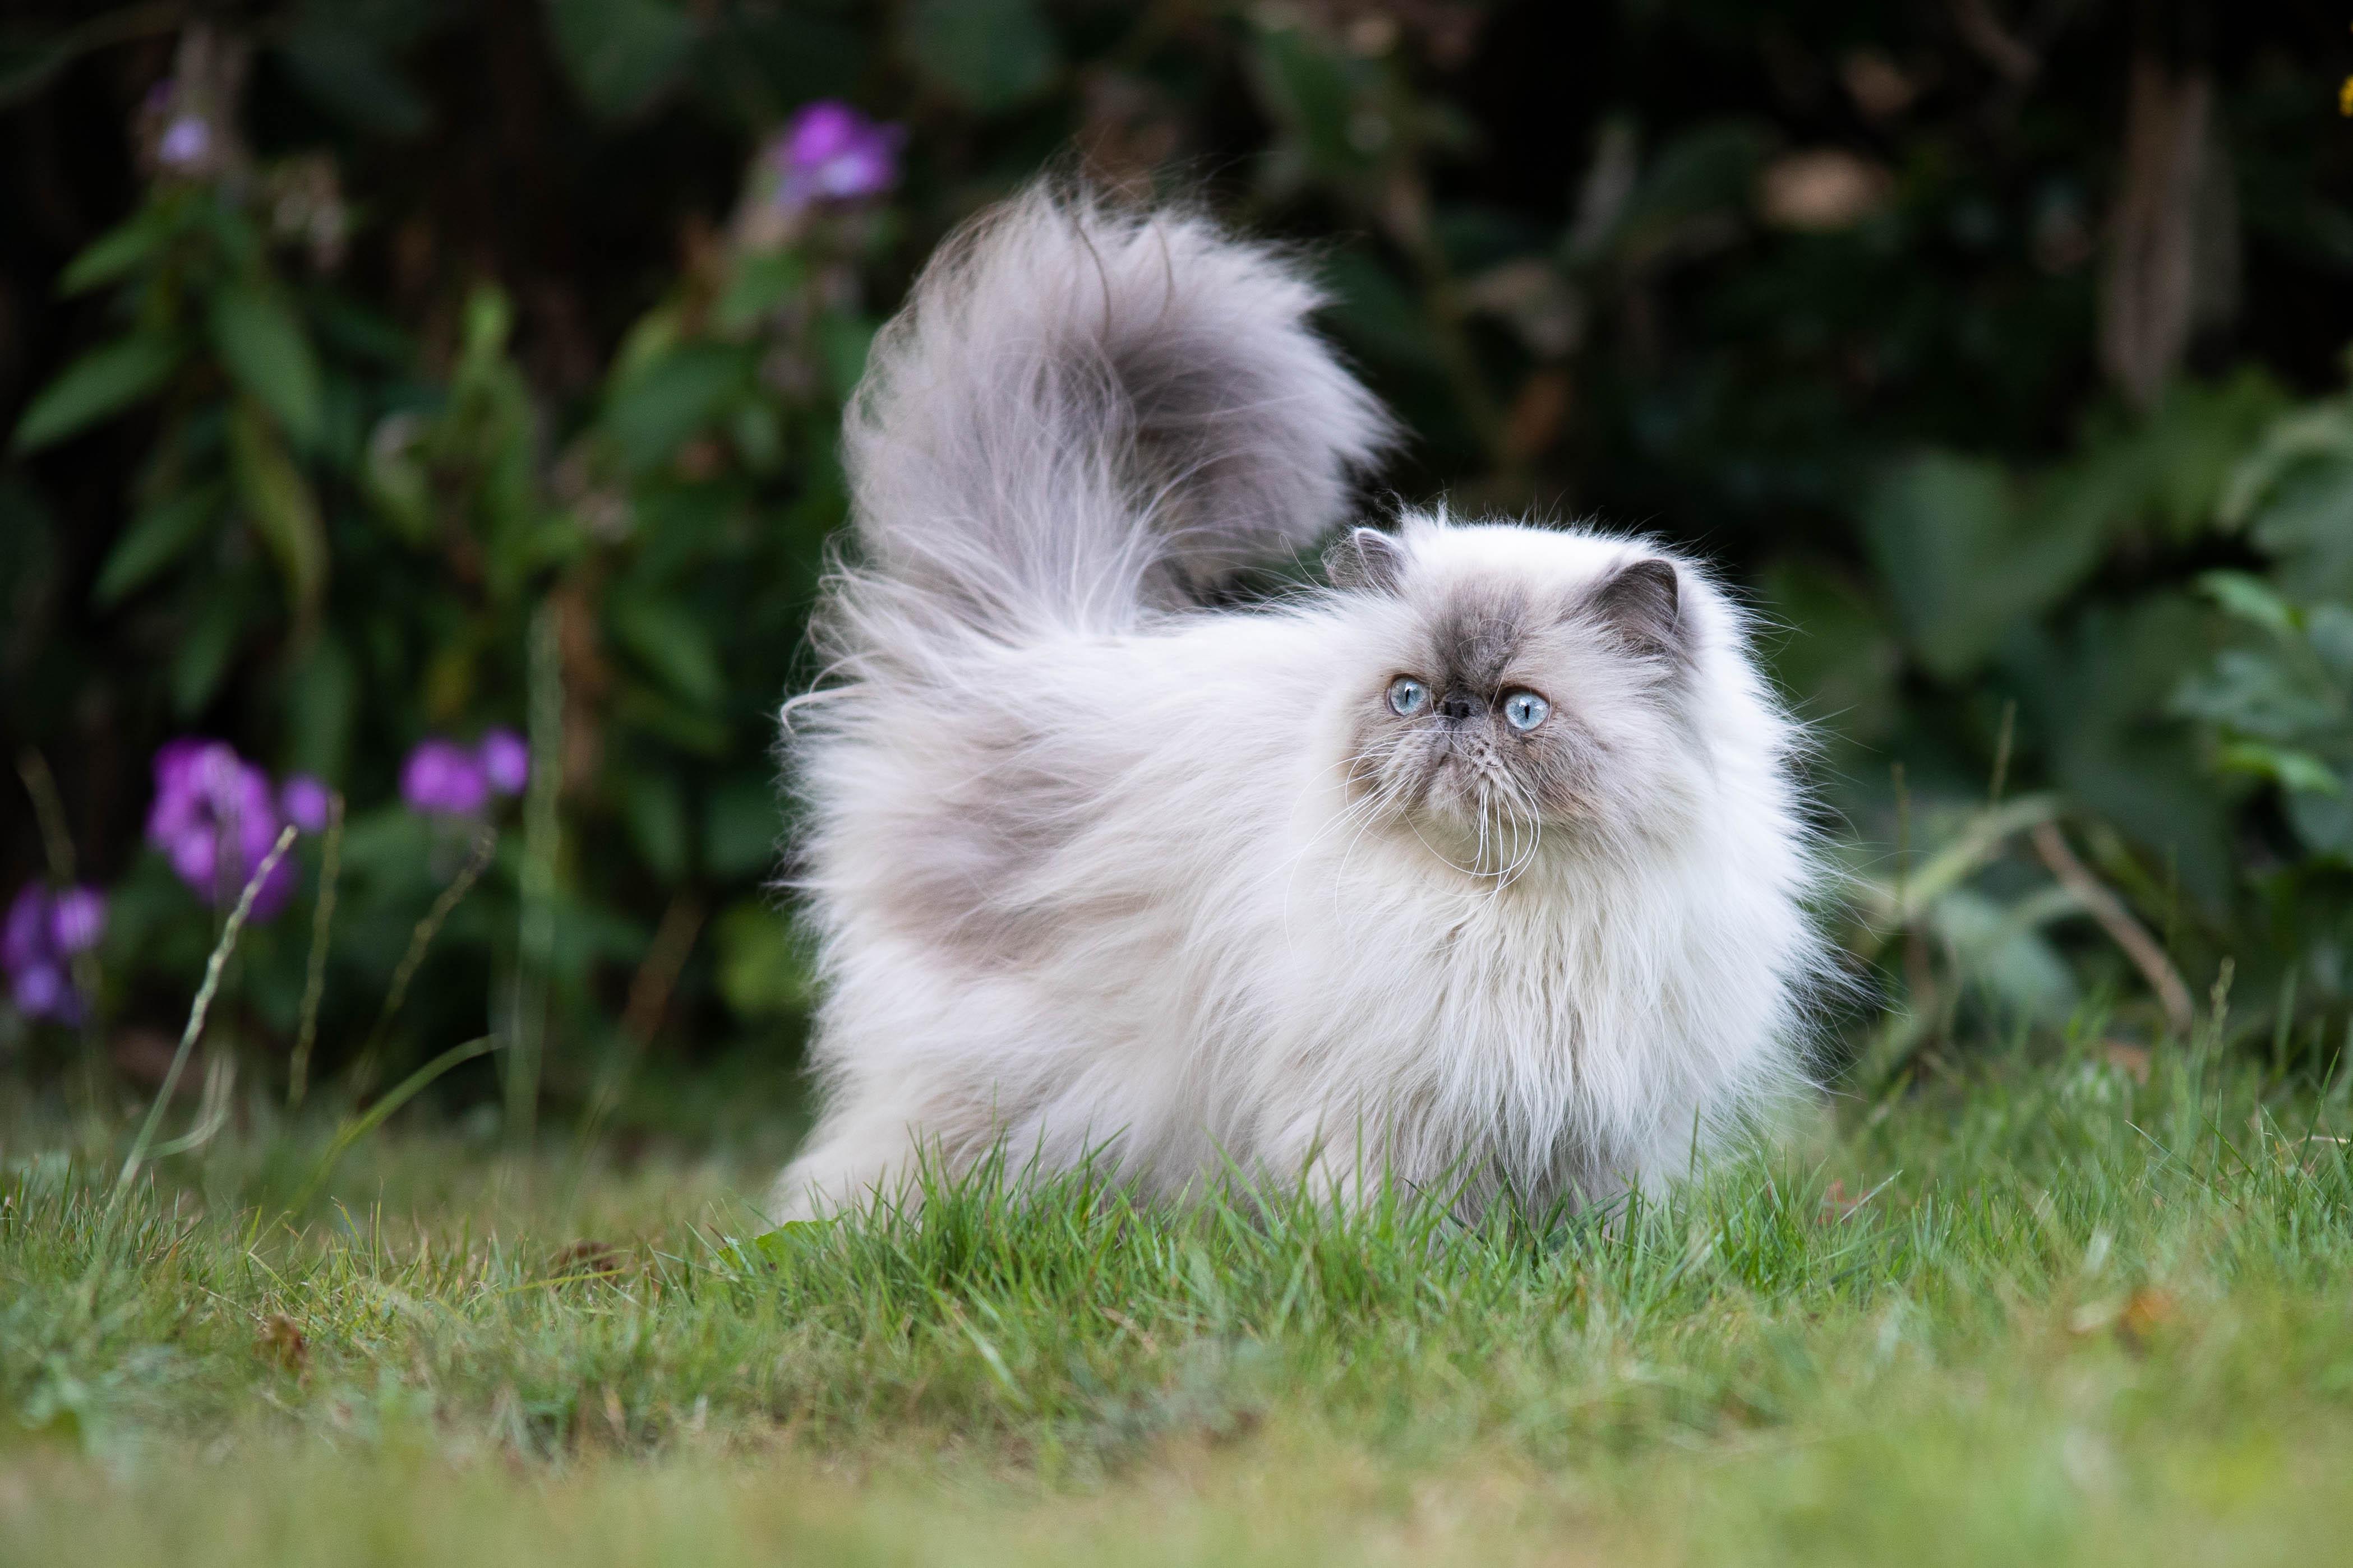 Marleen Verheul Fotografie, dierenfotografie, kattenfotografie, dierenfotograaf, Perzische kat in de tuin